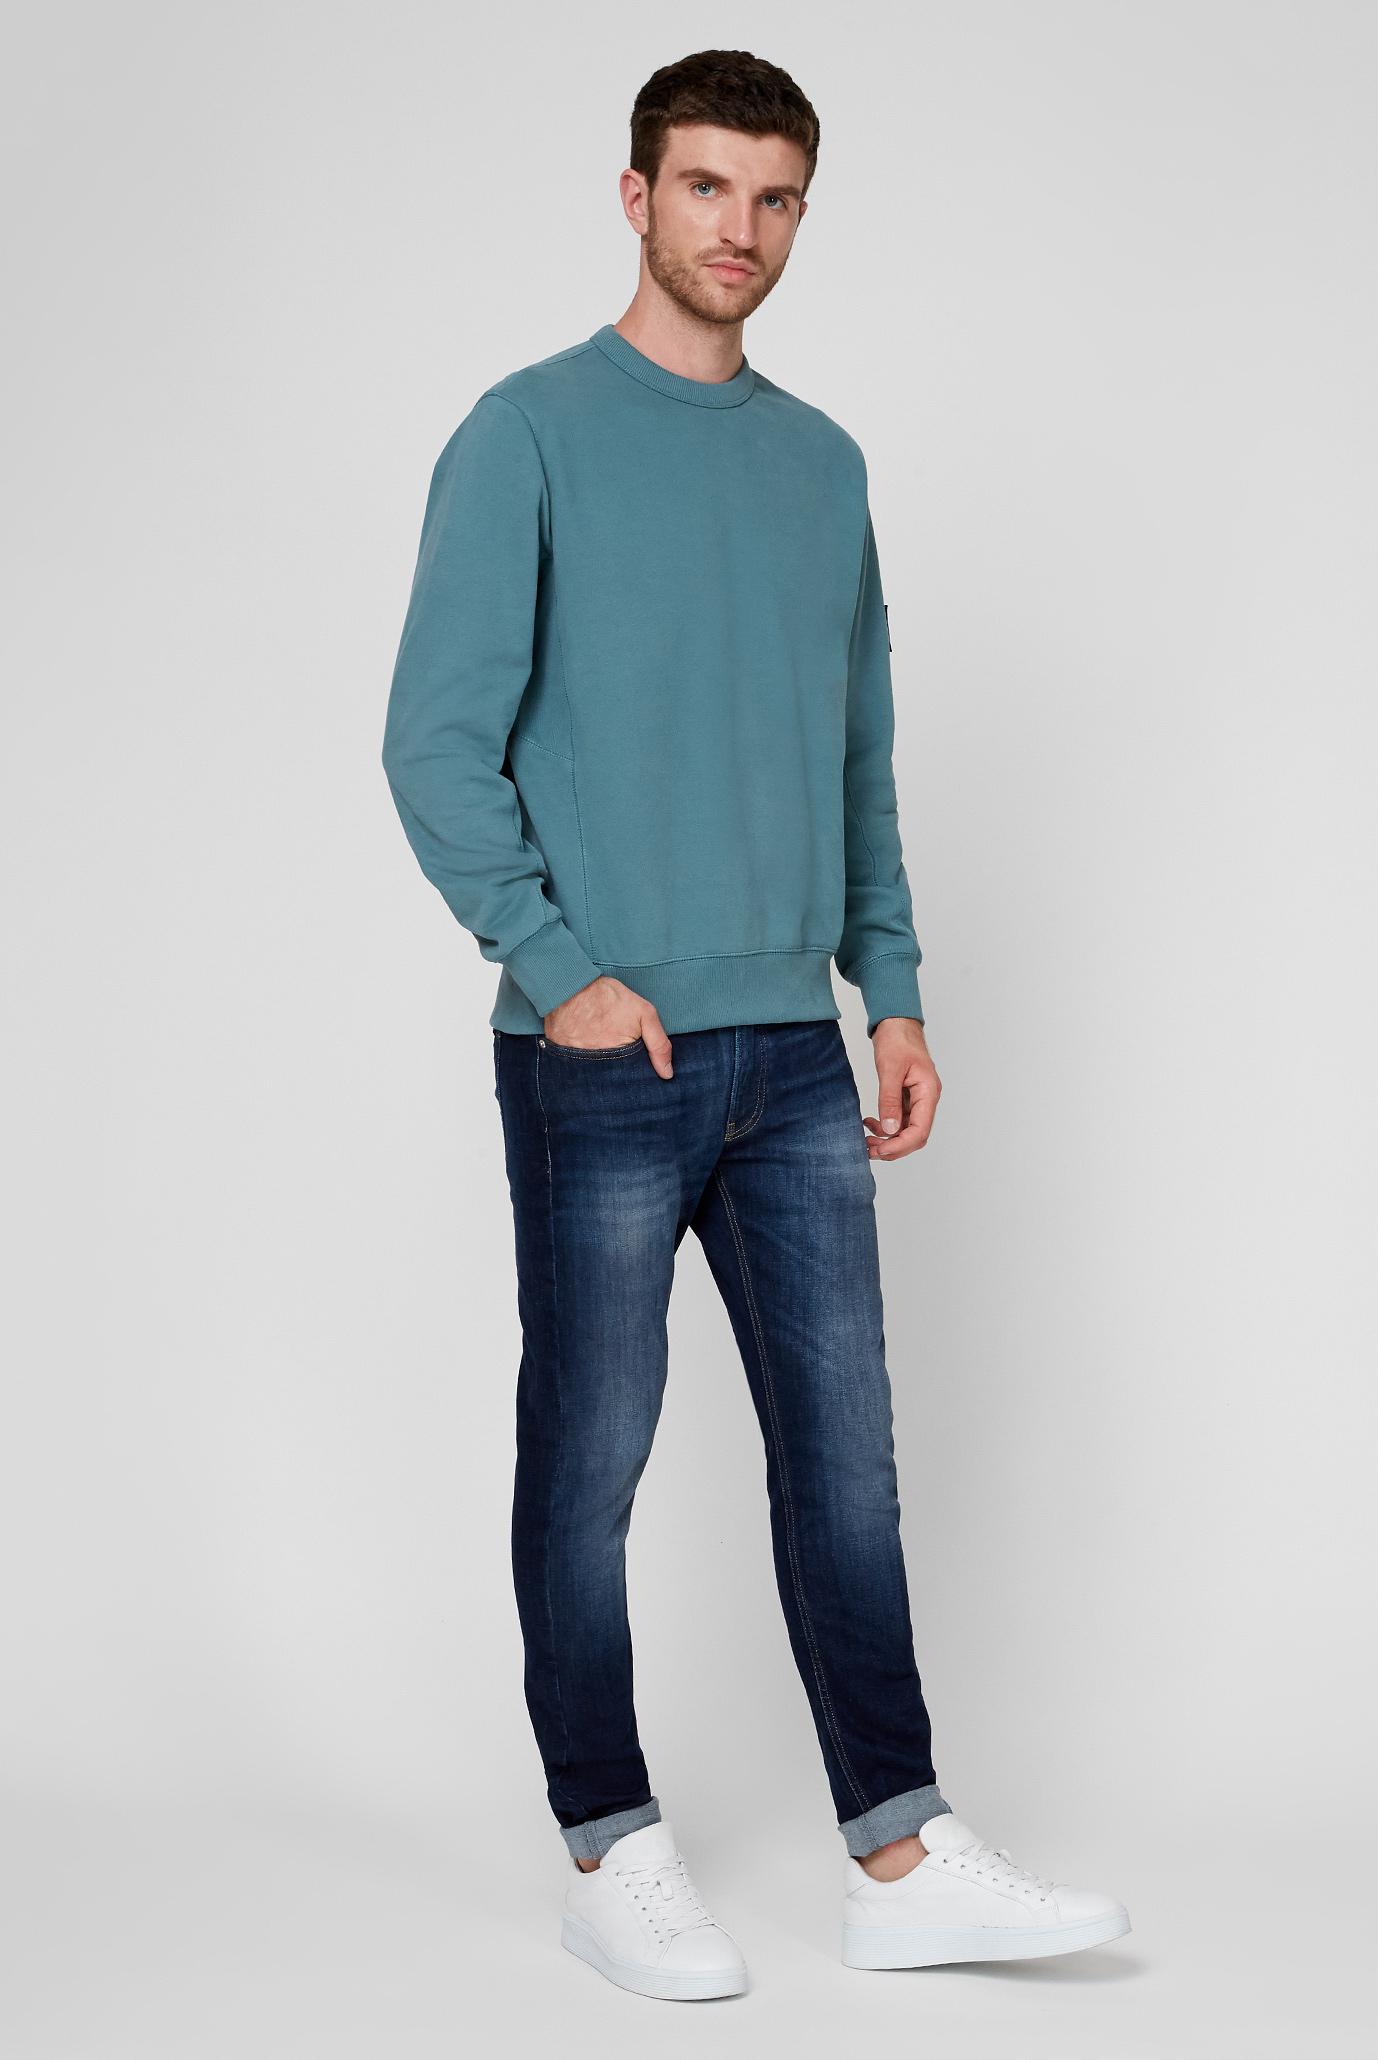 Мужские темно-синие джинсы CKJ 058 SLIM TAPER Calvin Klein